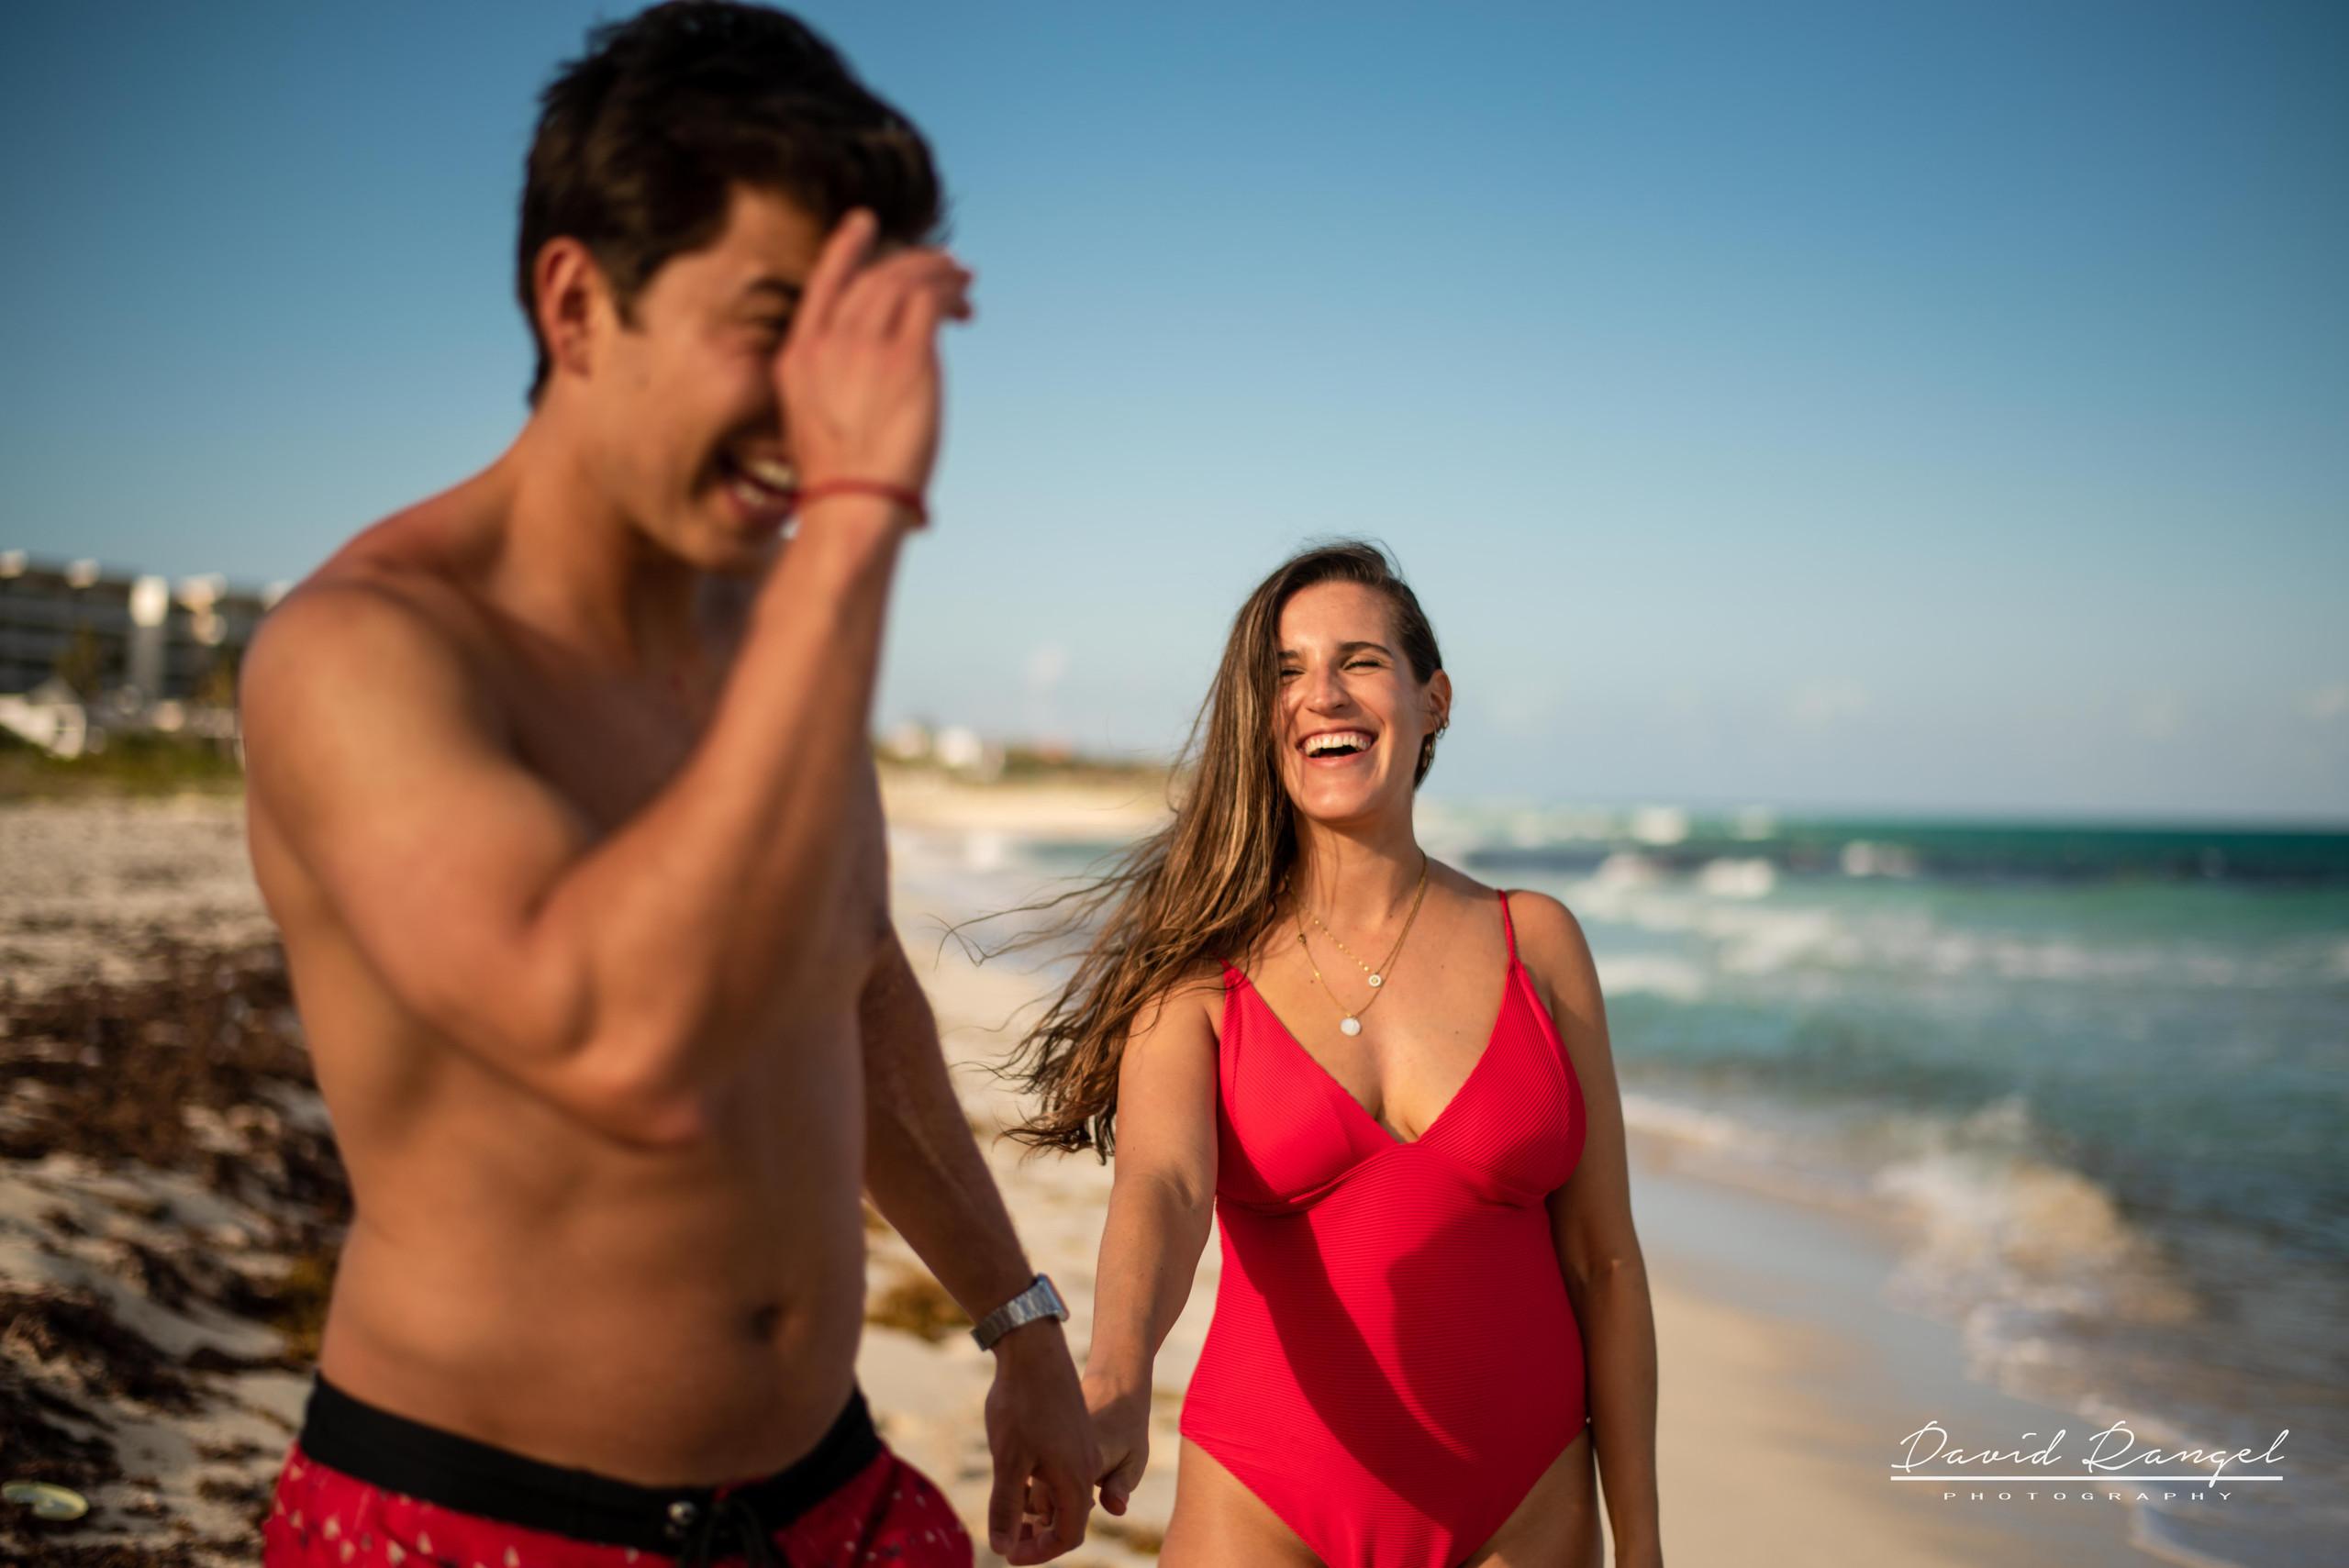 beach+session+riviera+maya+pregnancy+rocks+couple+future+mother+mom+love+walking+swimsuit